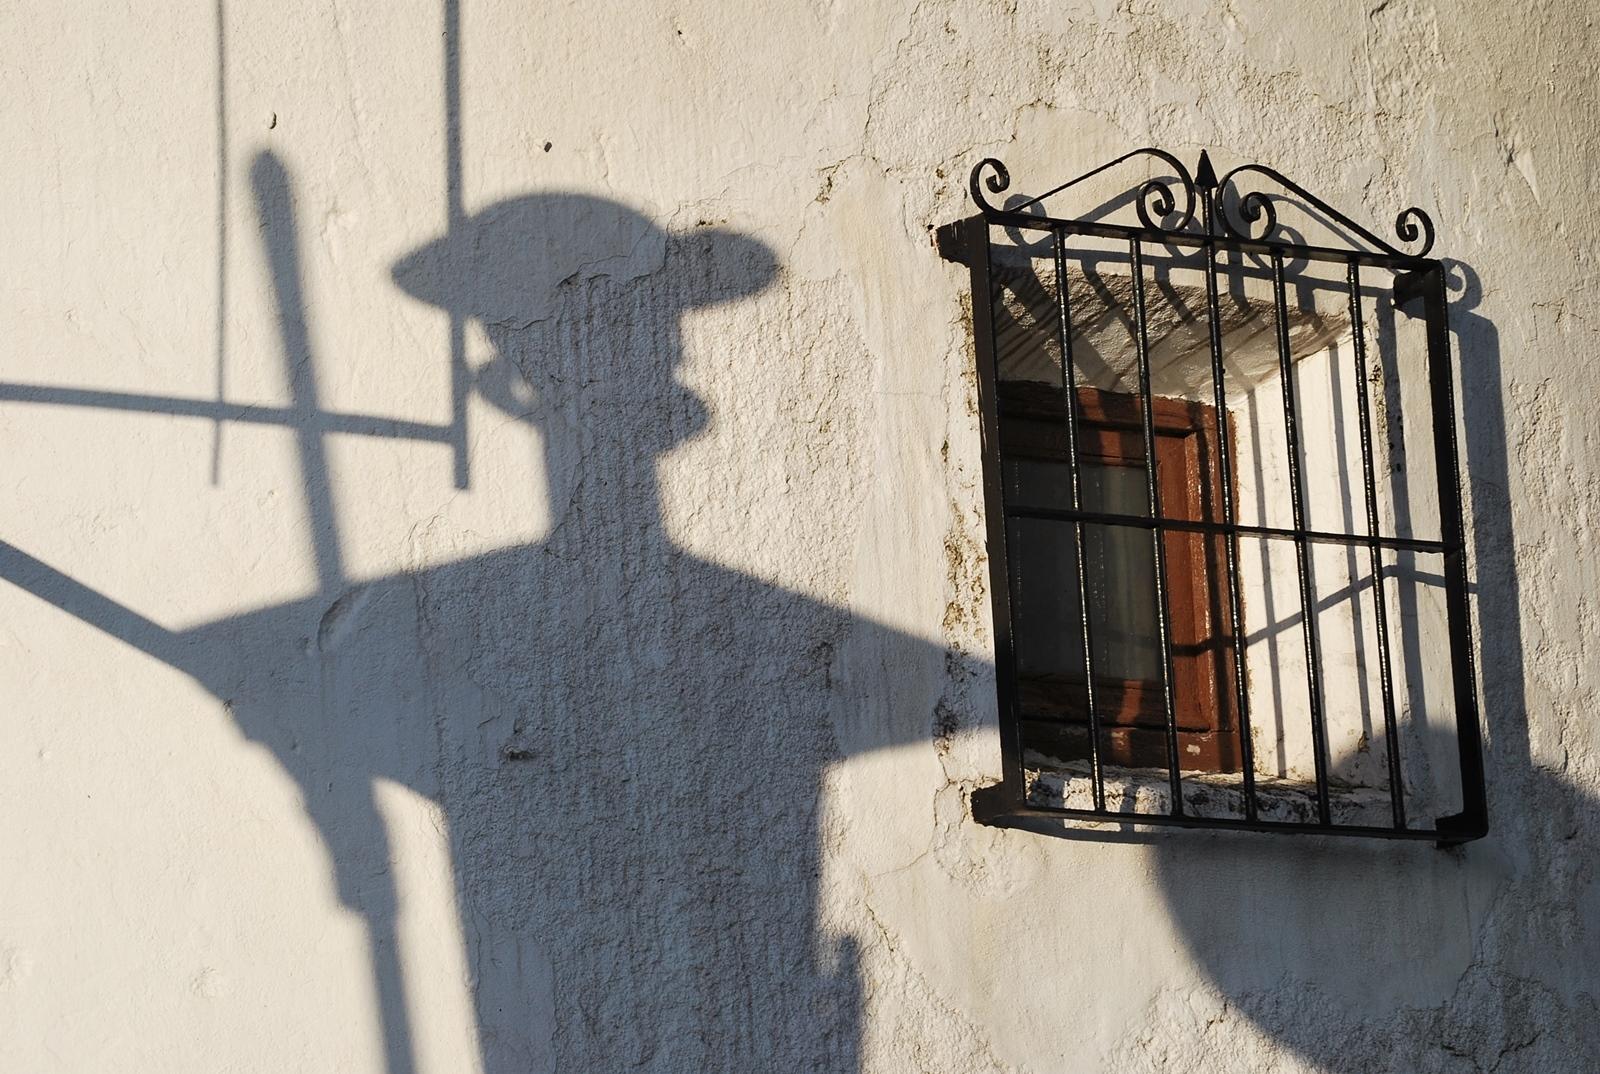 La sombra de Don Quijote. Autora, Maite Moya Díaz - Pintado